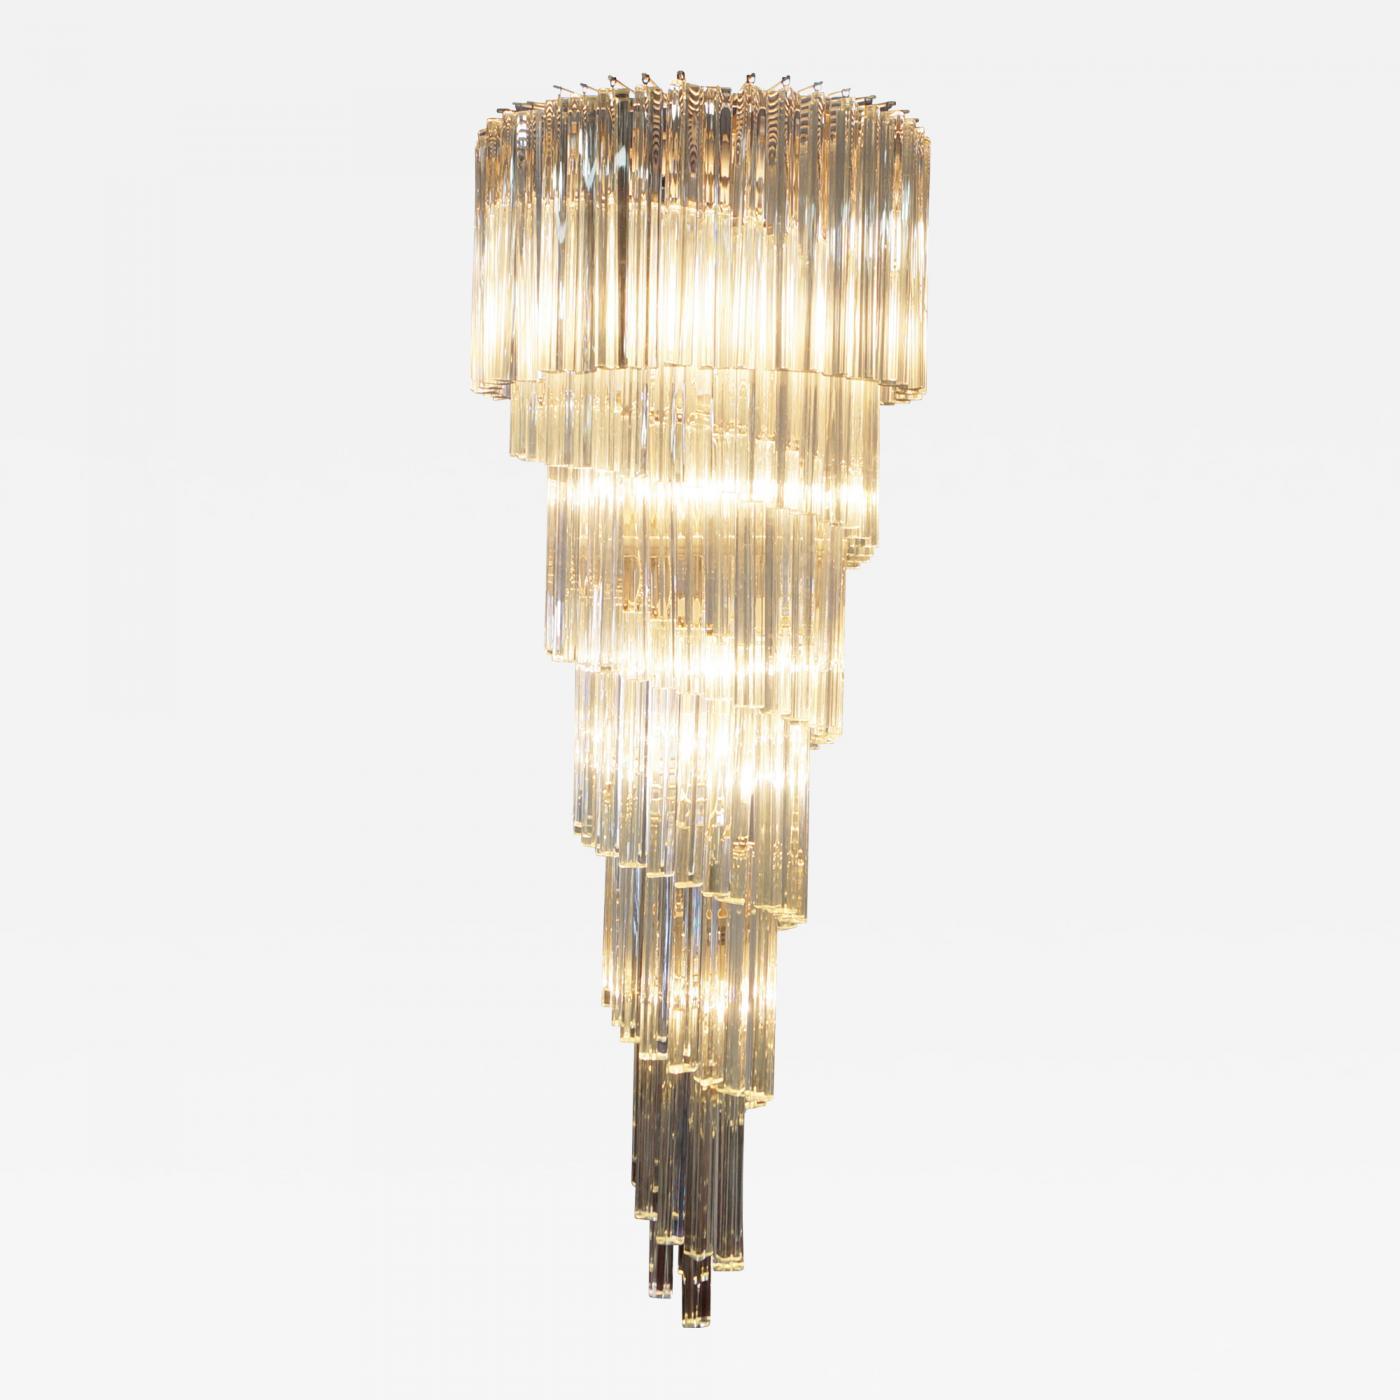 dering encased glass century transitional dwmmaloos chandelier ceiling lucite modern chandeliers mid lighting hall